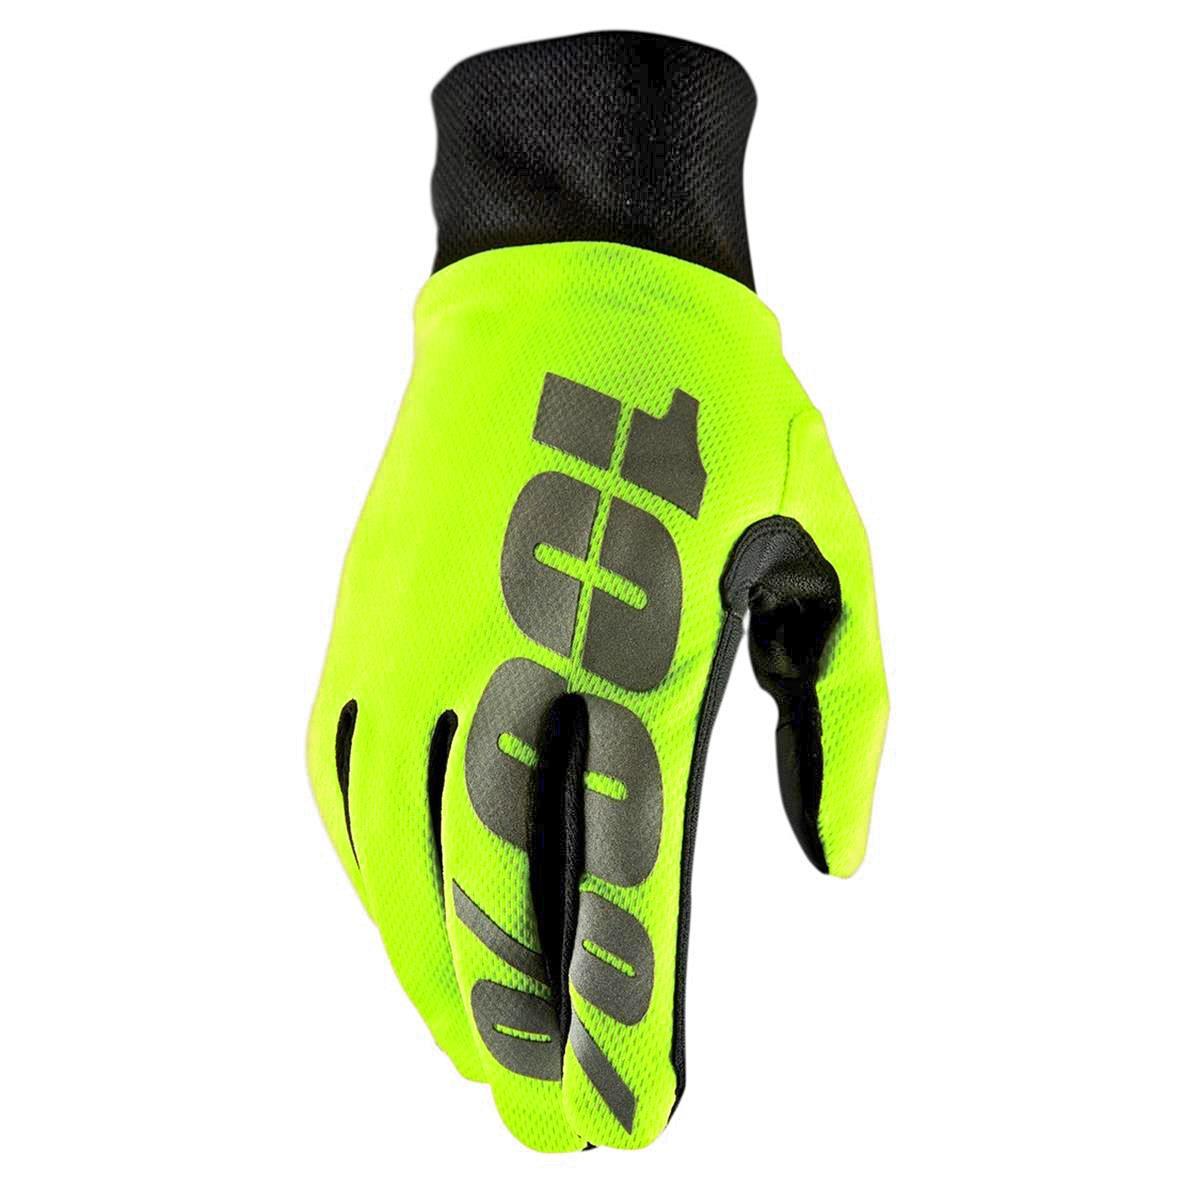 100% Bike-Handschuhe Hydromatic Waterproof Neongelb